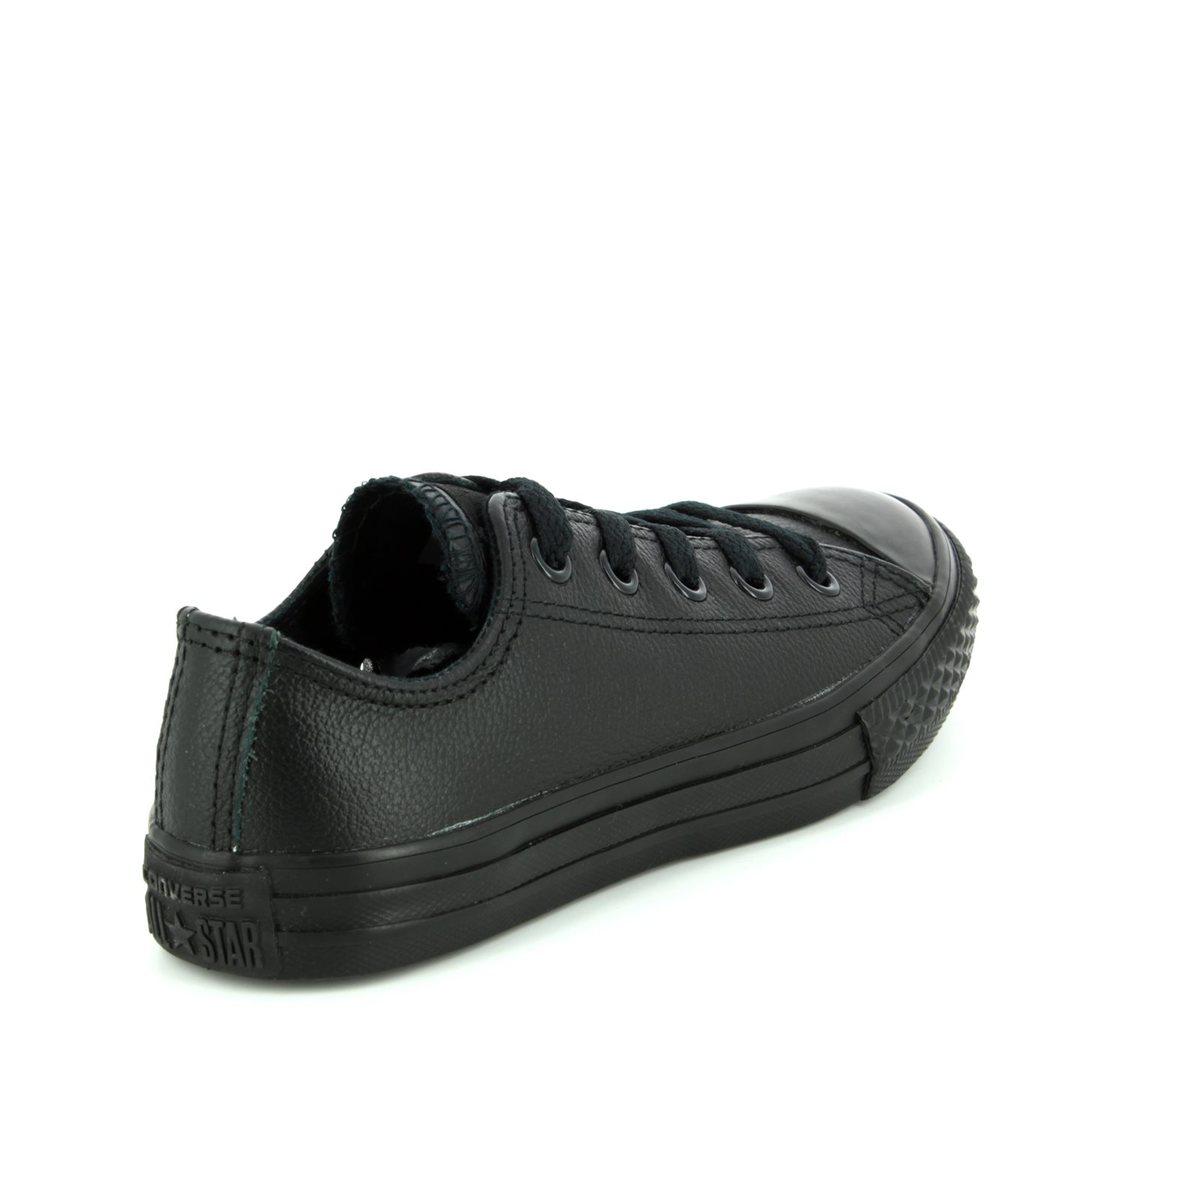 7d6f45a96859 Converse Trainers - Black - 343913C Chuck Taylor Allstar OX Mono Leather